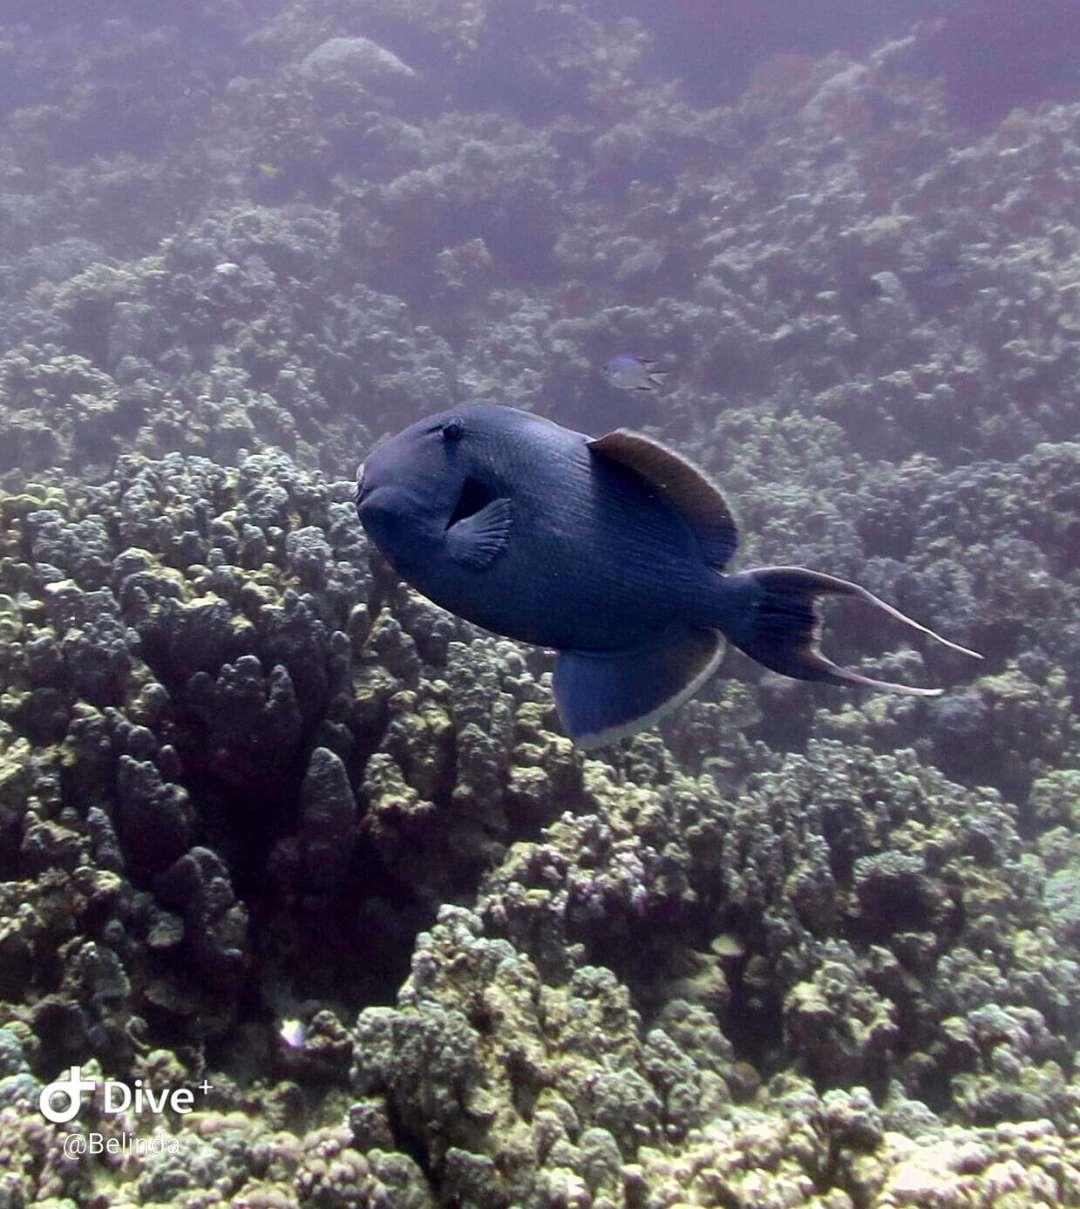 Dive+潜水员p1xuzf5b5n47c2ik447zlko6z的精彩瞬间